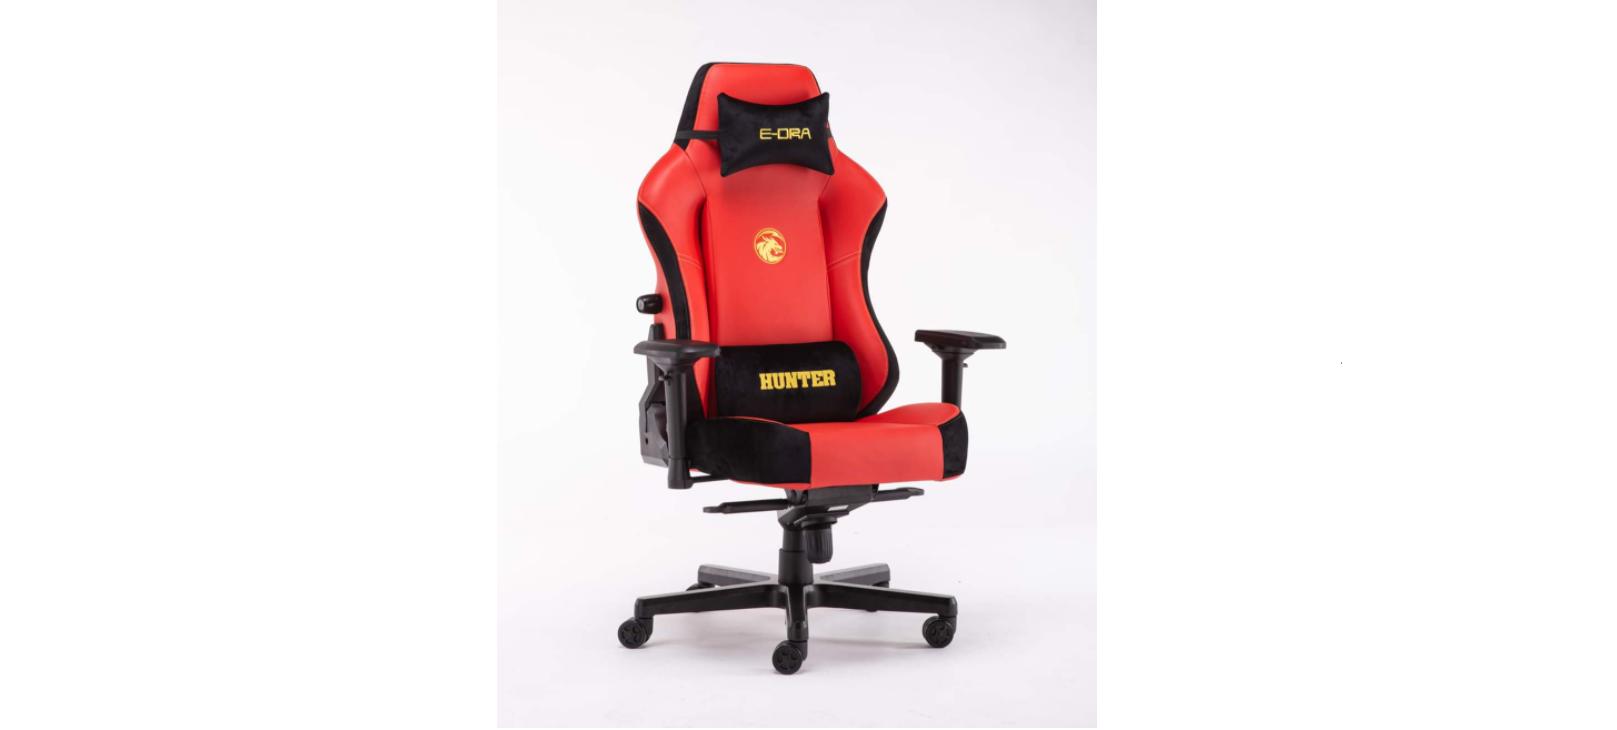 Ghế game E-Dra Hunter Gaming Chair - EGC 206 Red  sử dụng da PU cao cấp